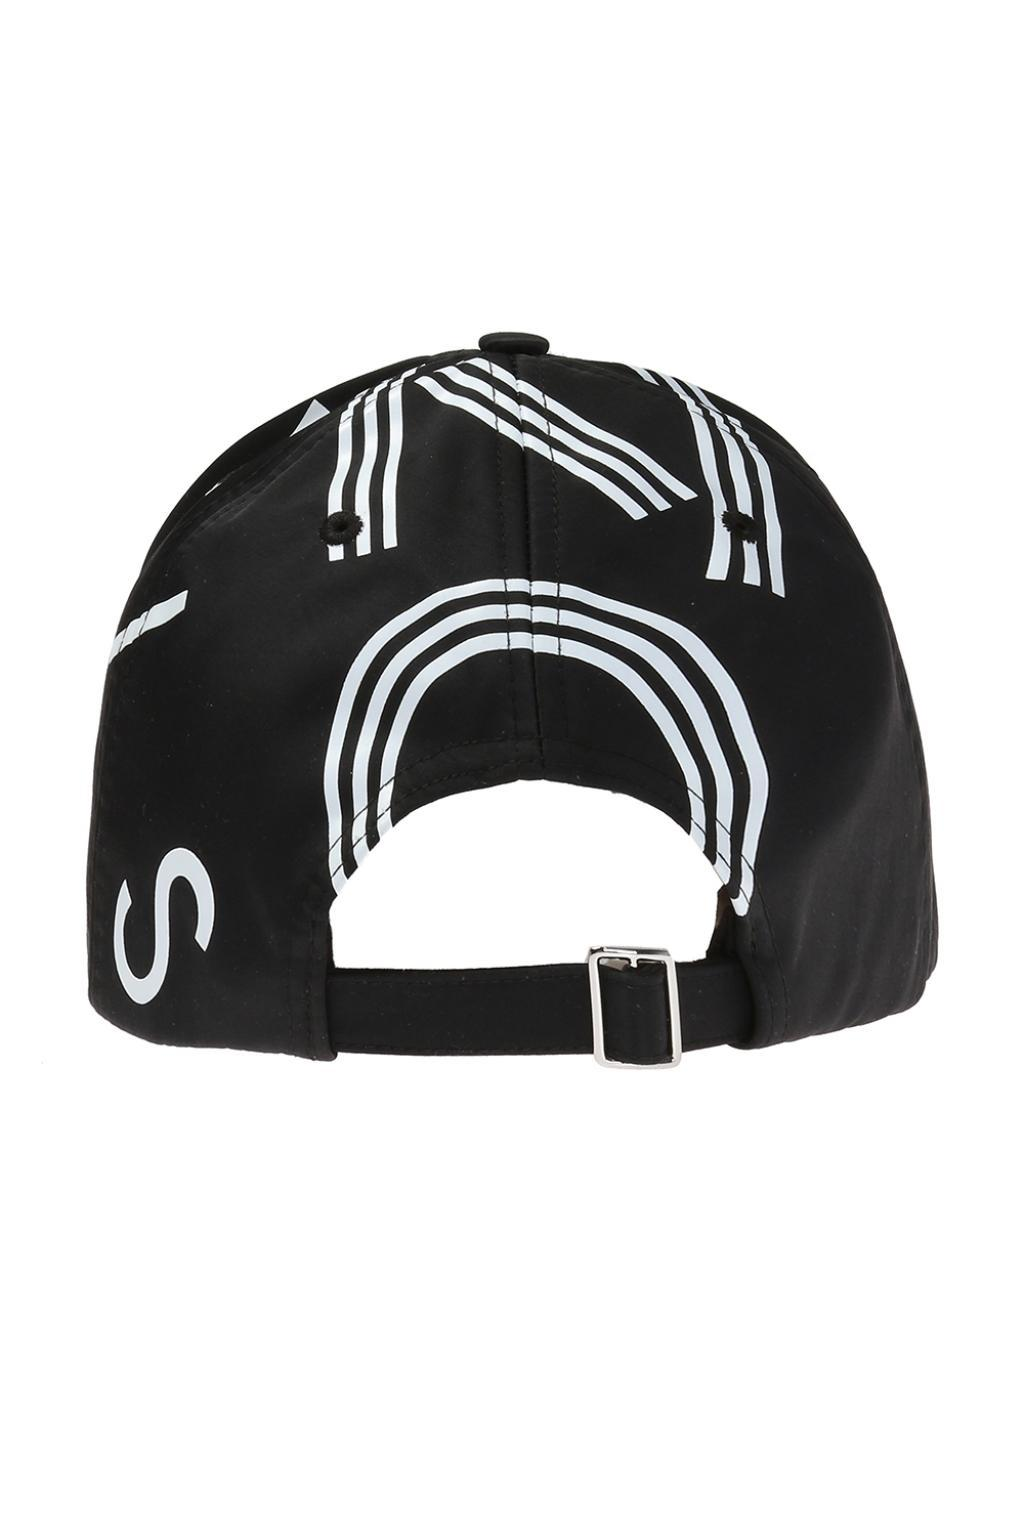 9173390d KENZO - Black Baseball Cap With Logo for Men - Lyst. View fullscreen